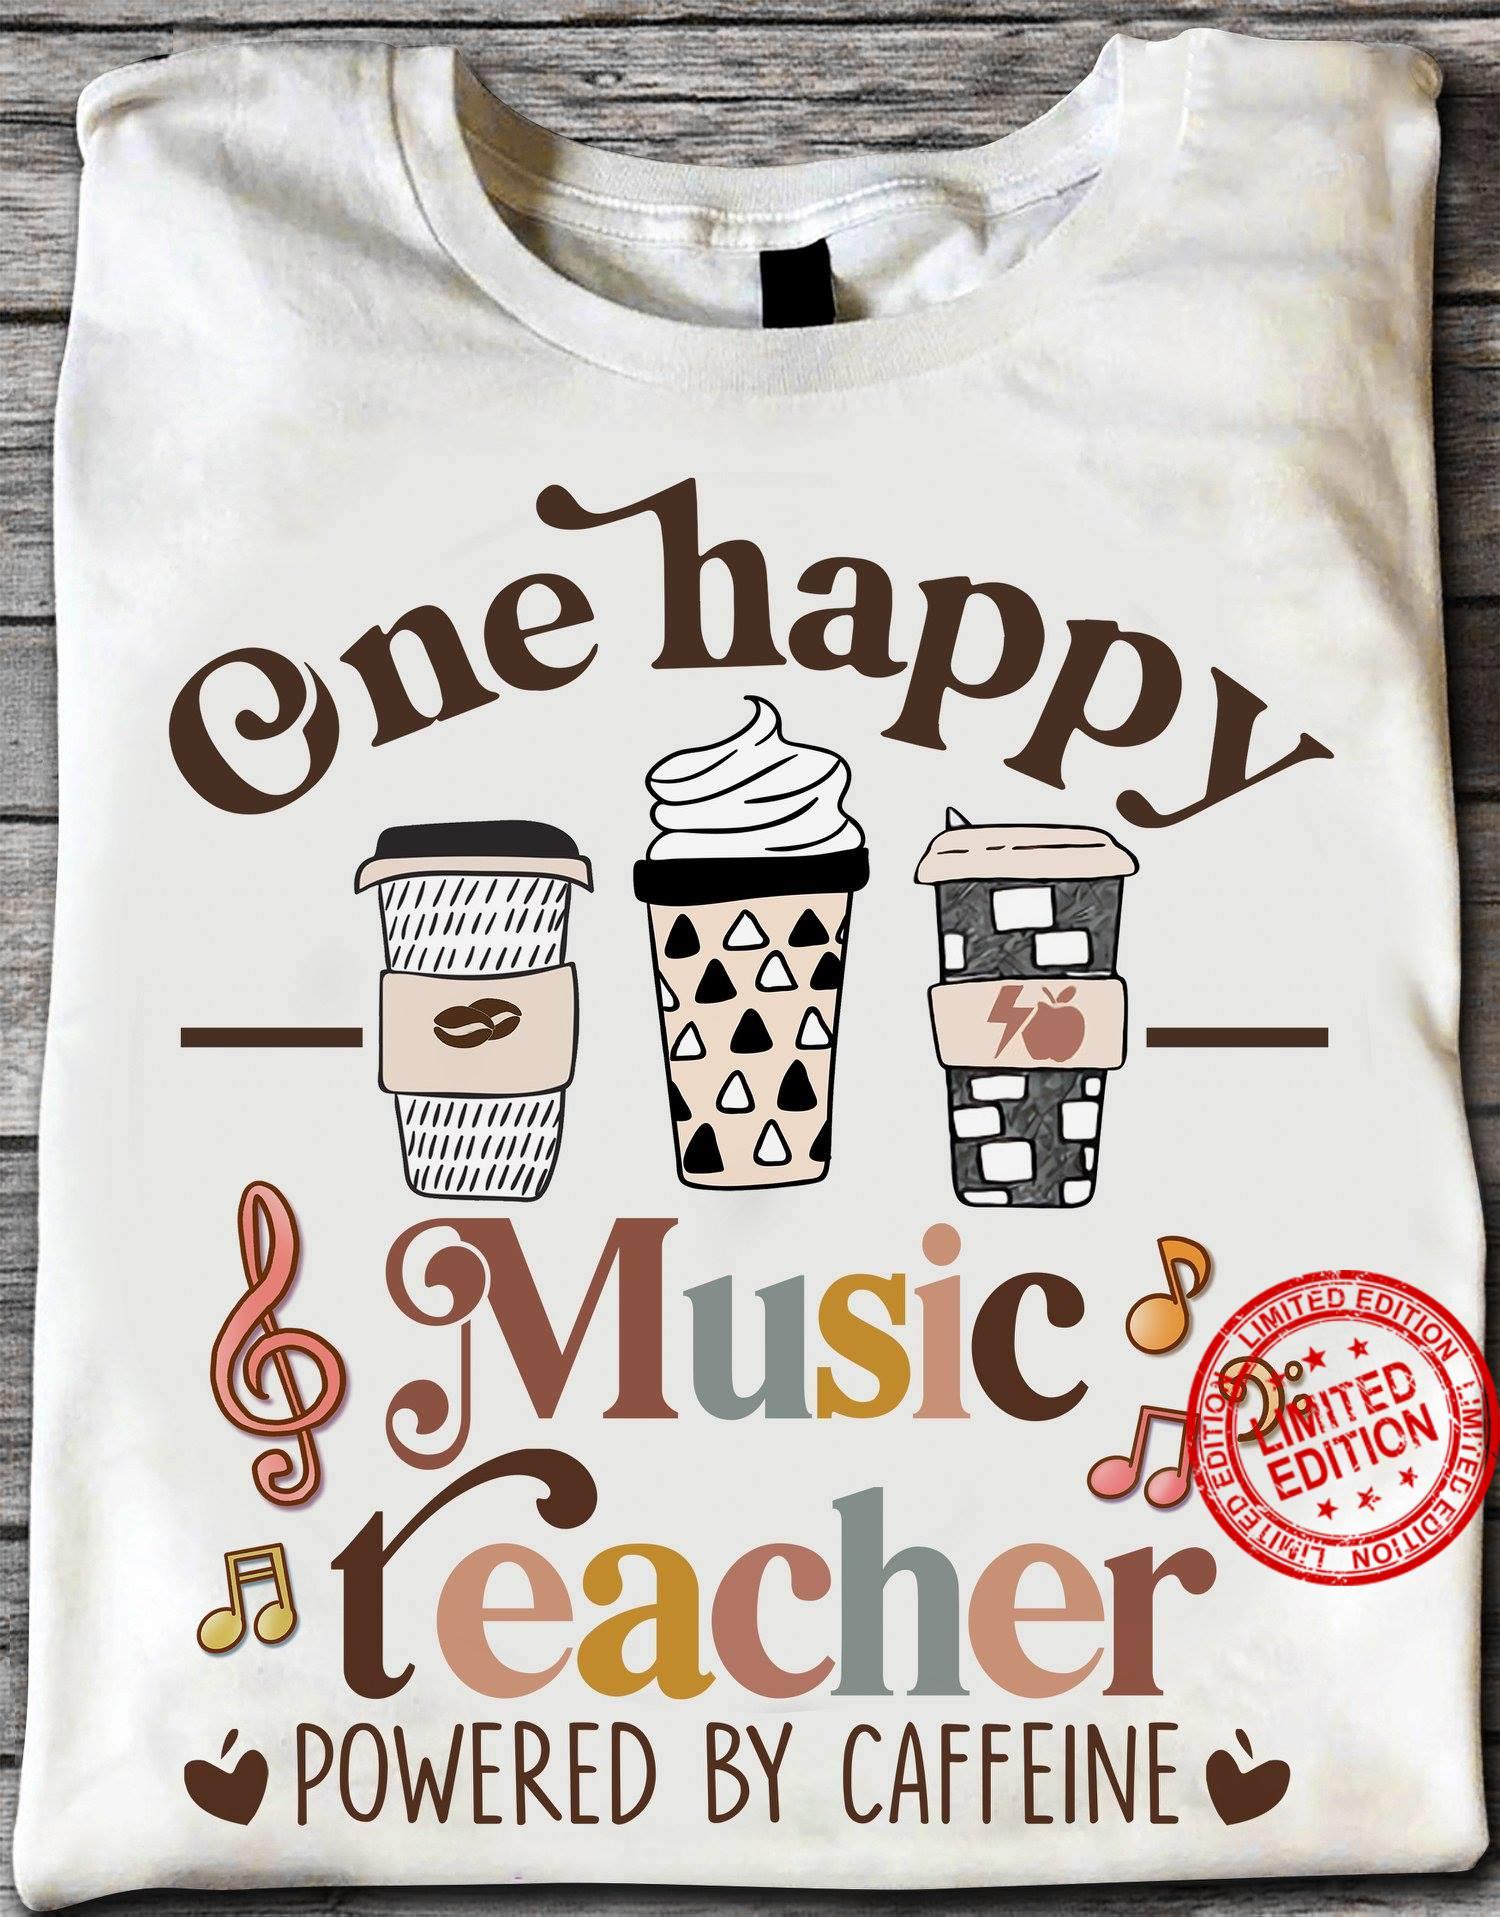 One Happy Music Teacher Powered By Caffeine Shirt